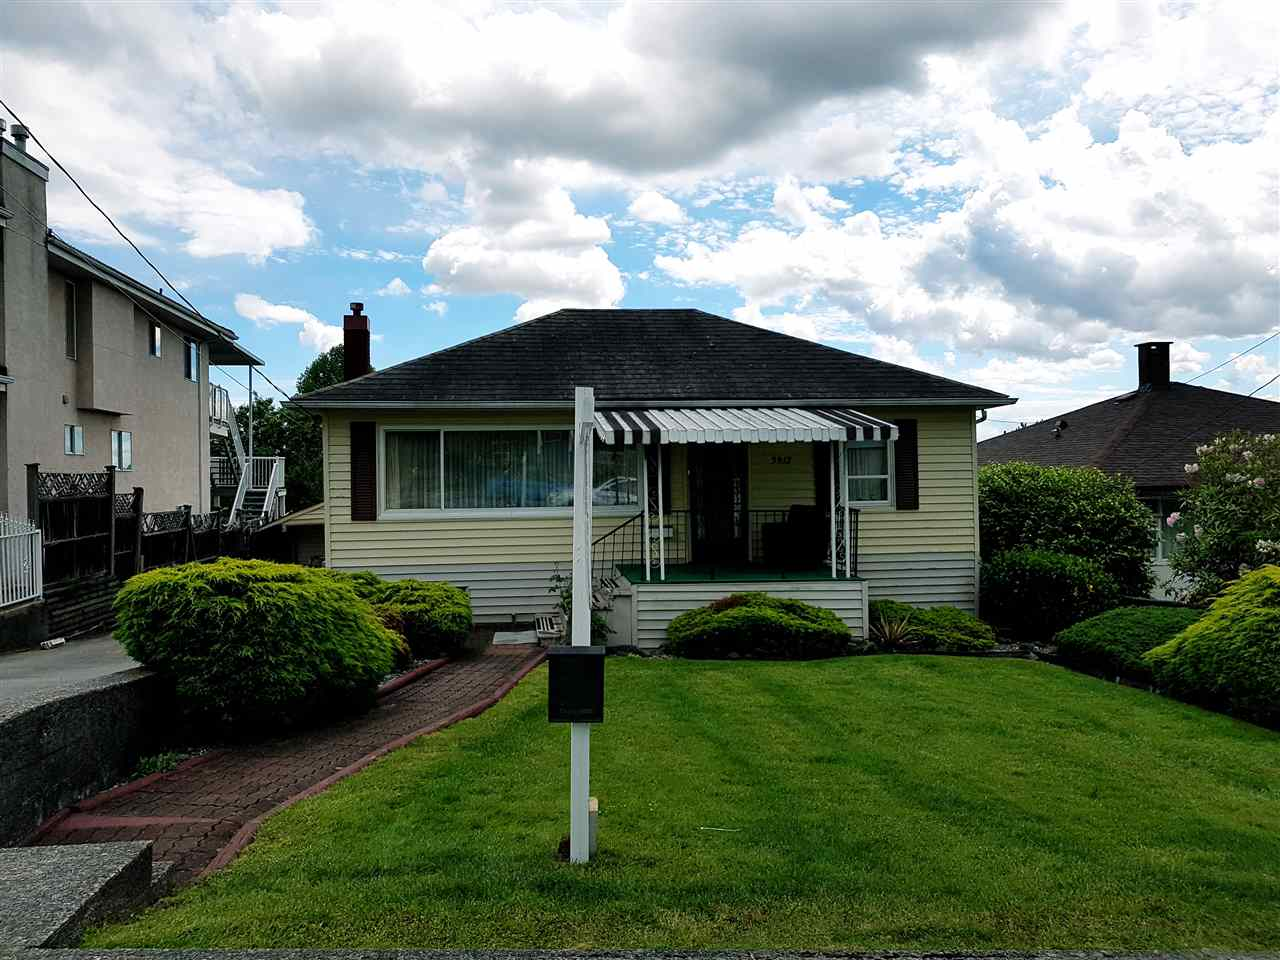 Detached at 3912 NAPIER STREET, Burnaby North, British Columbia. Image 1